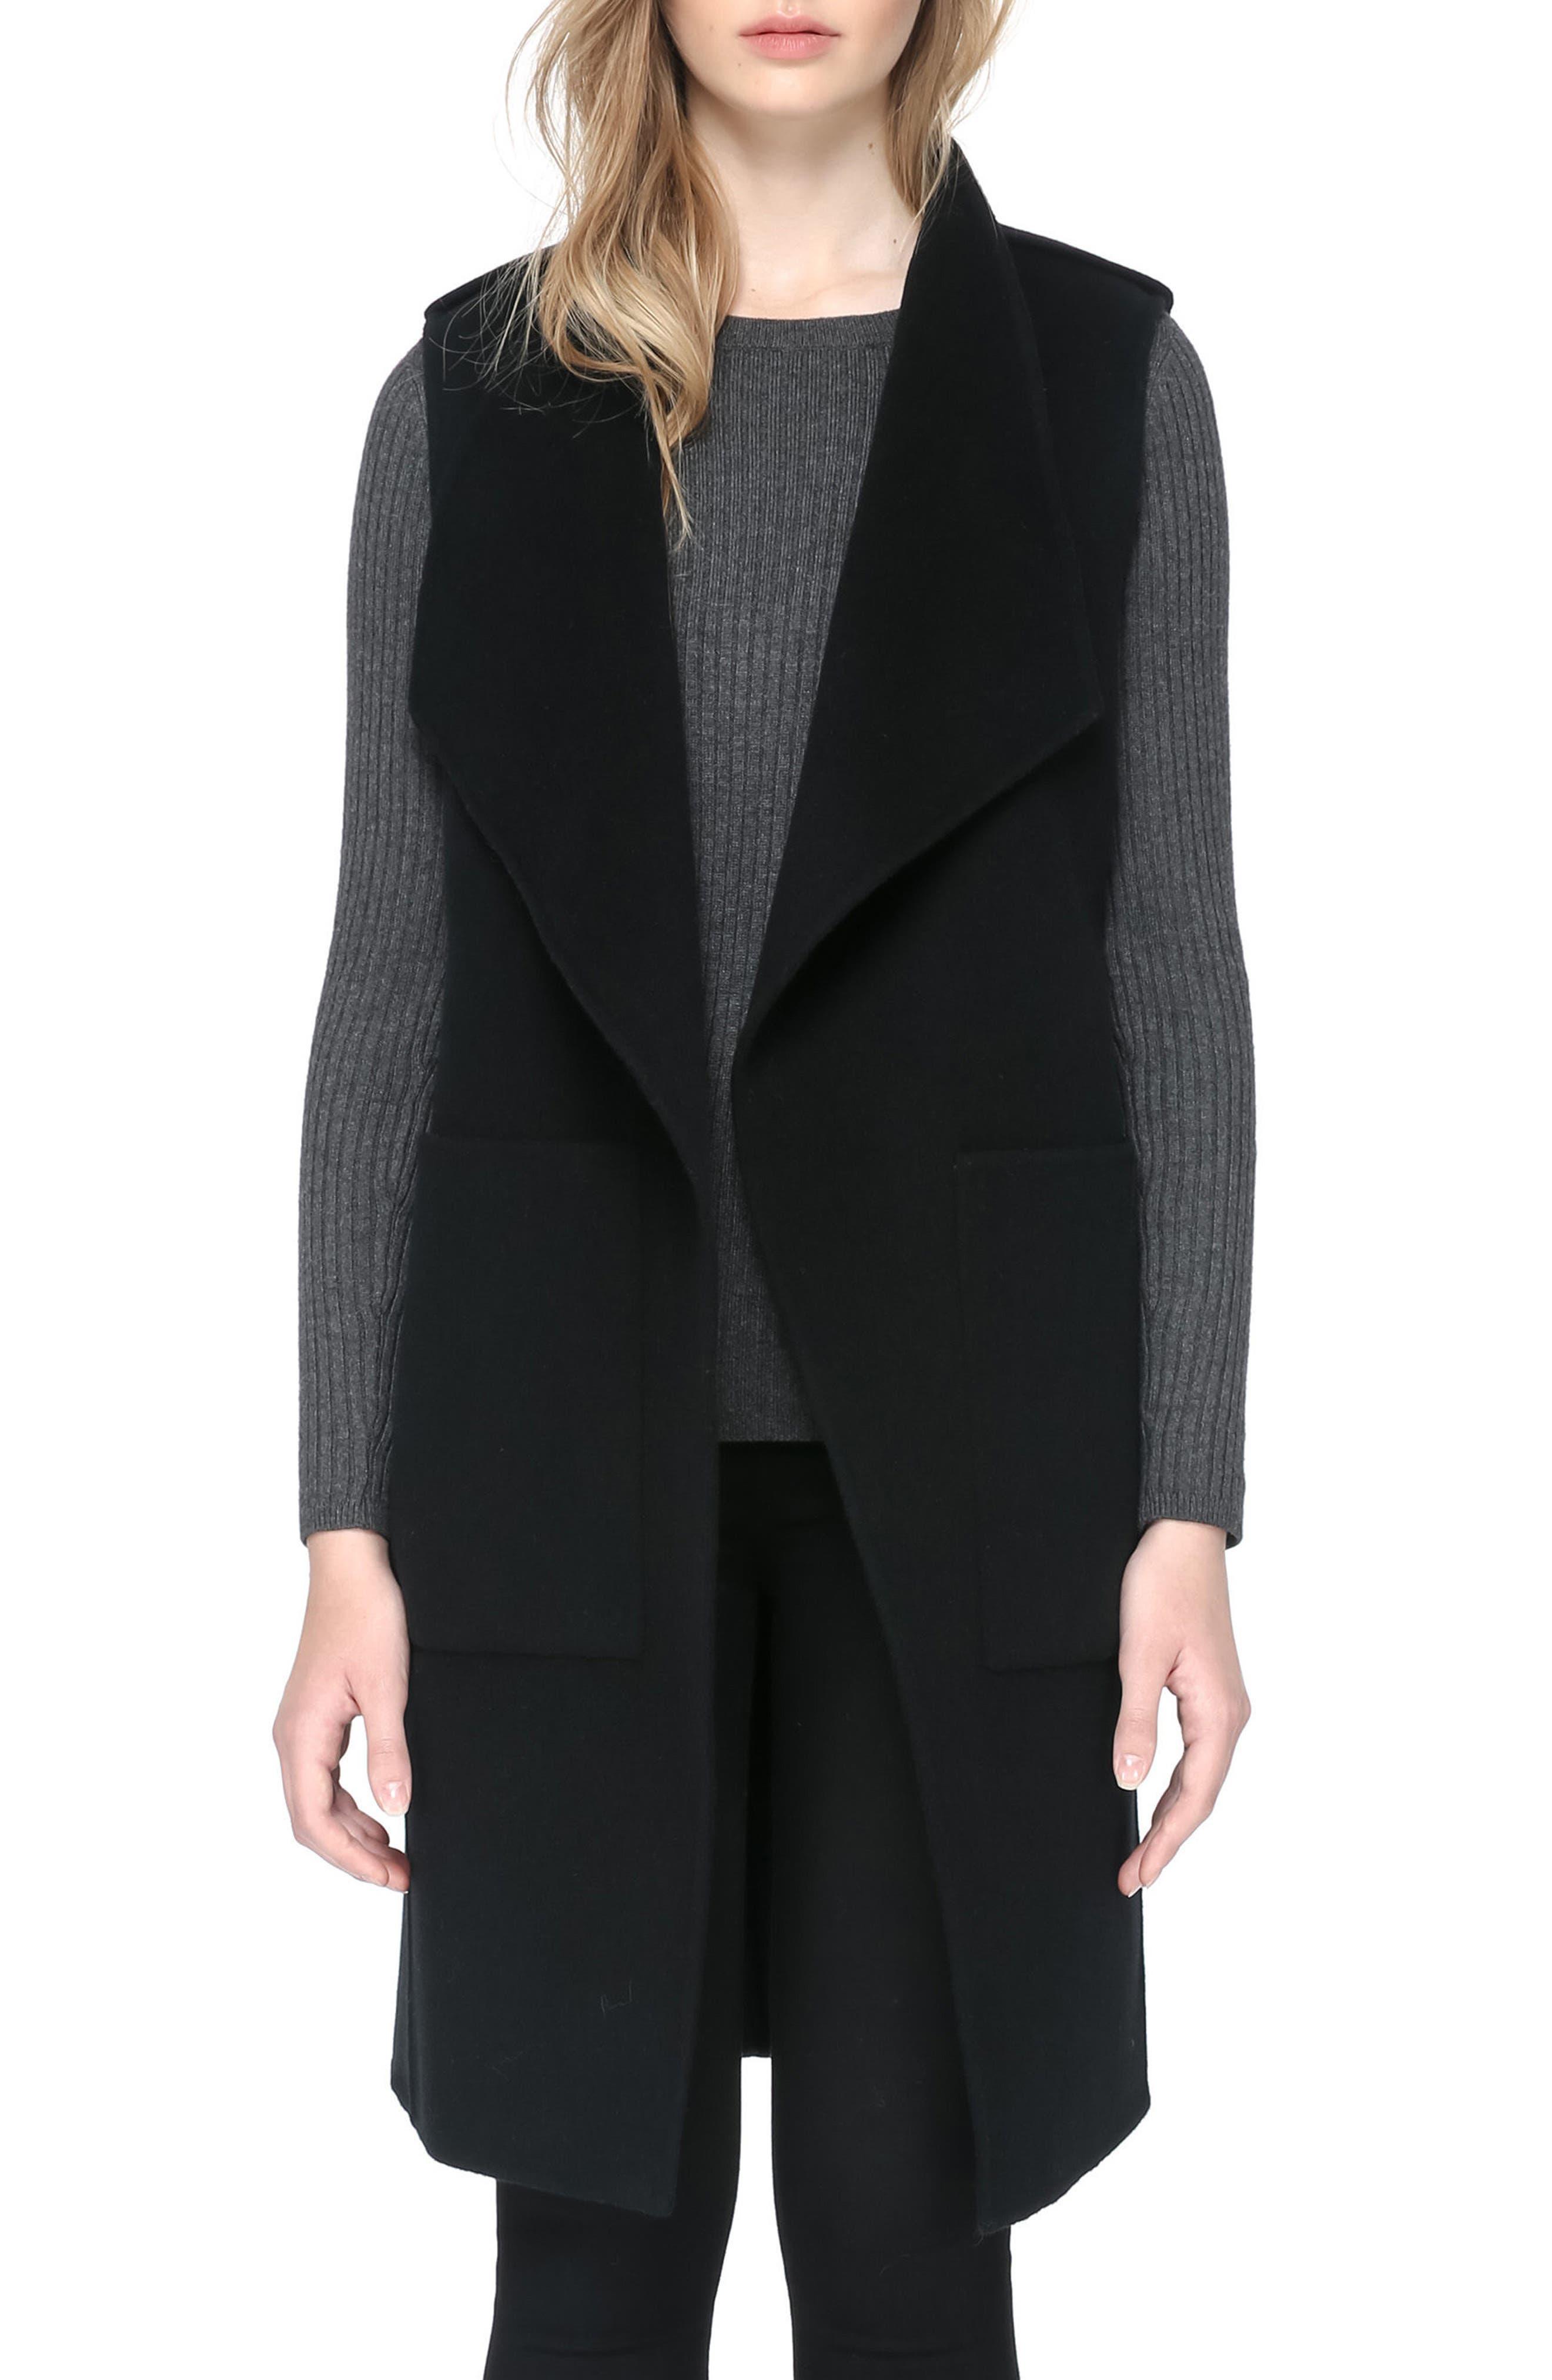 SOIA & KYO Reversible Wool Blend Vest, Main, color, 001